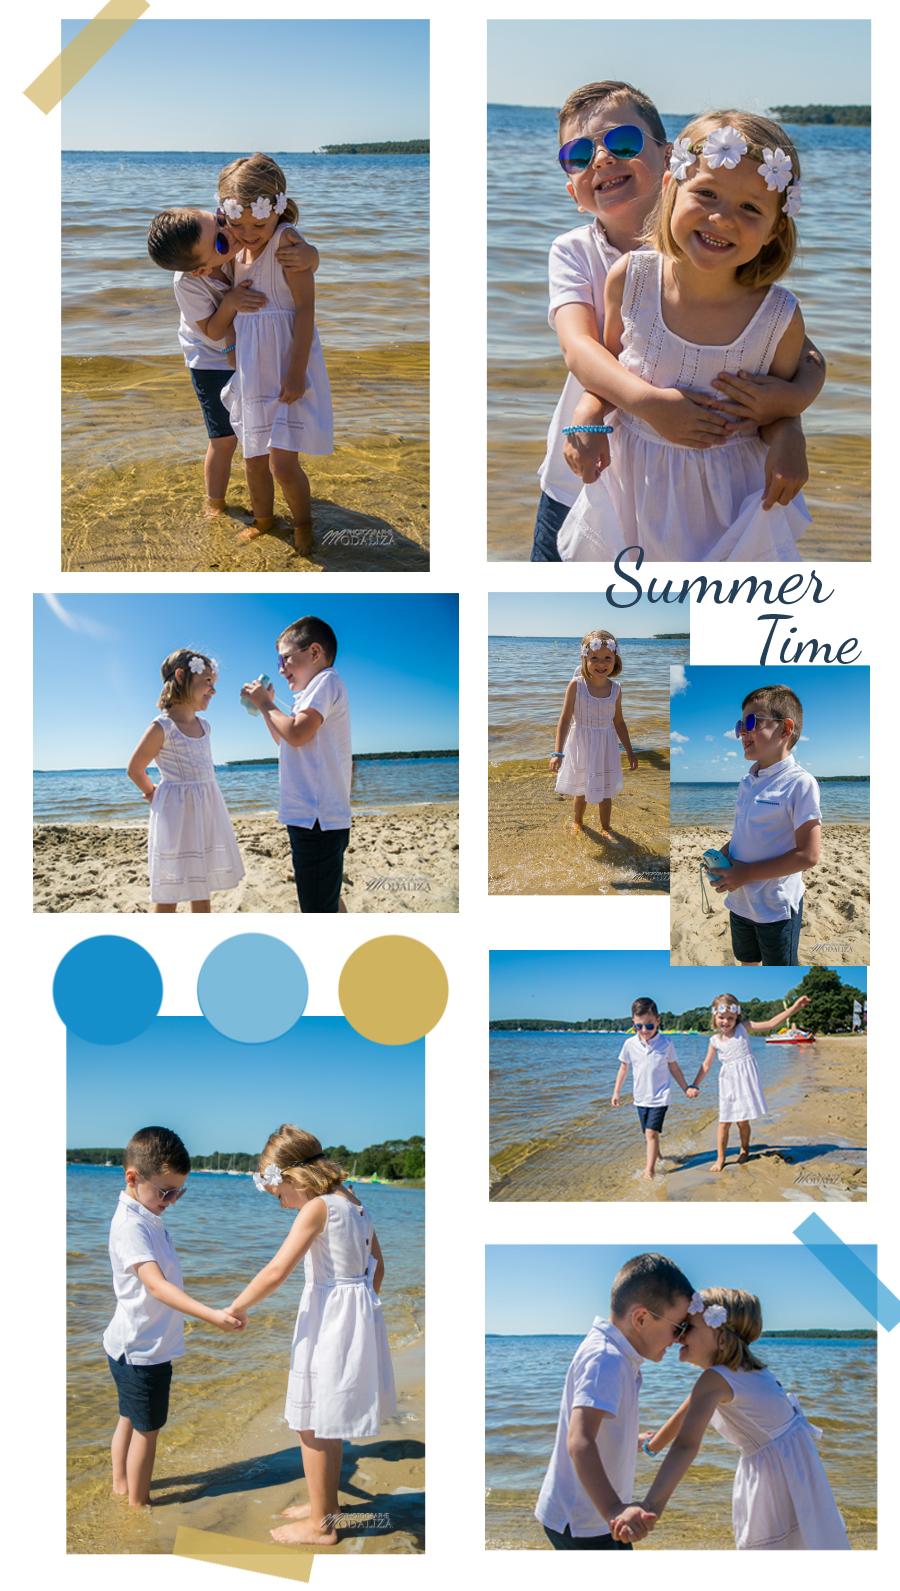 amour 4 saisons photo couple ete summer love kids enfants by modaliza photographe